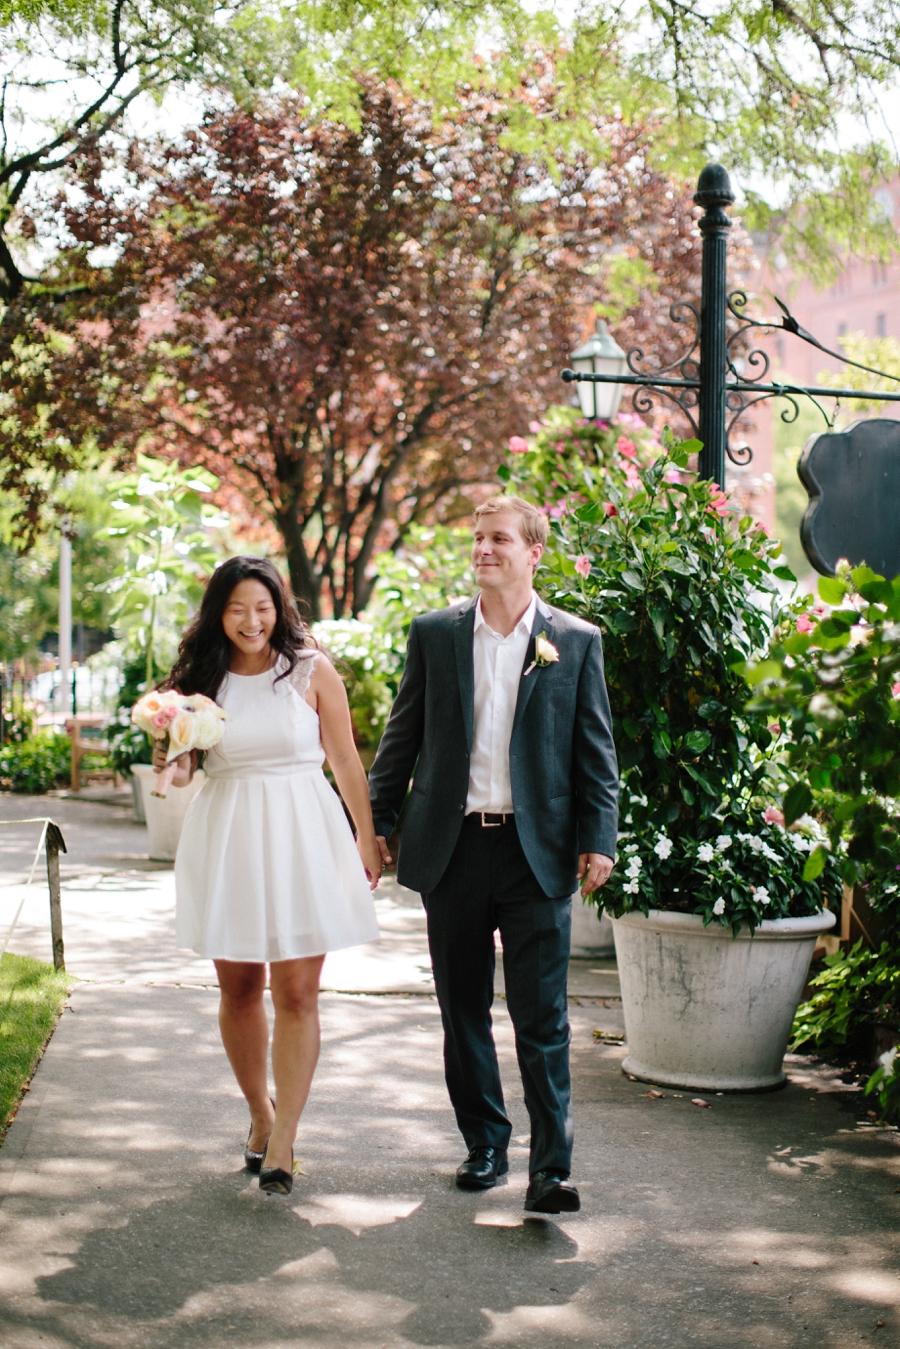 elopement-wedding-photographer-ny-nj-destination_0023.jpg